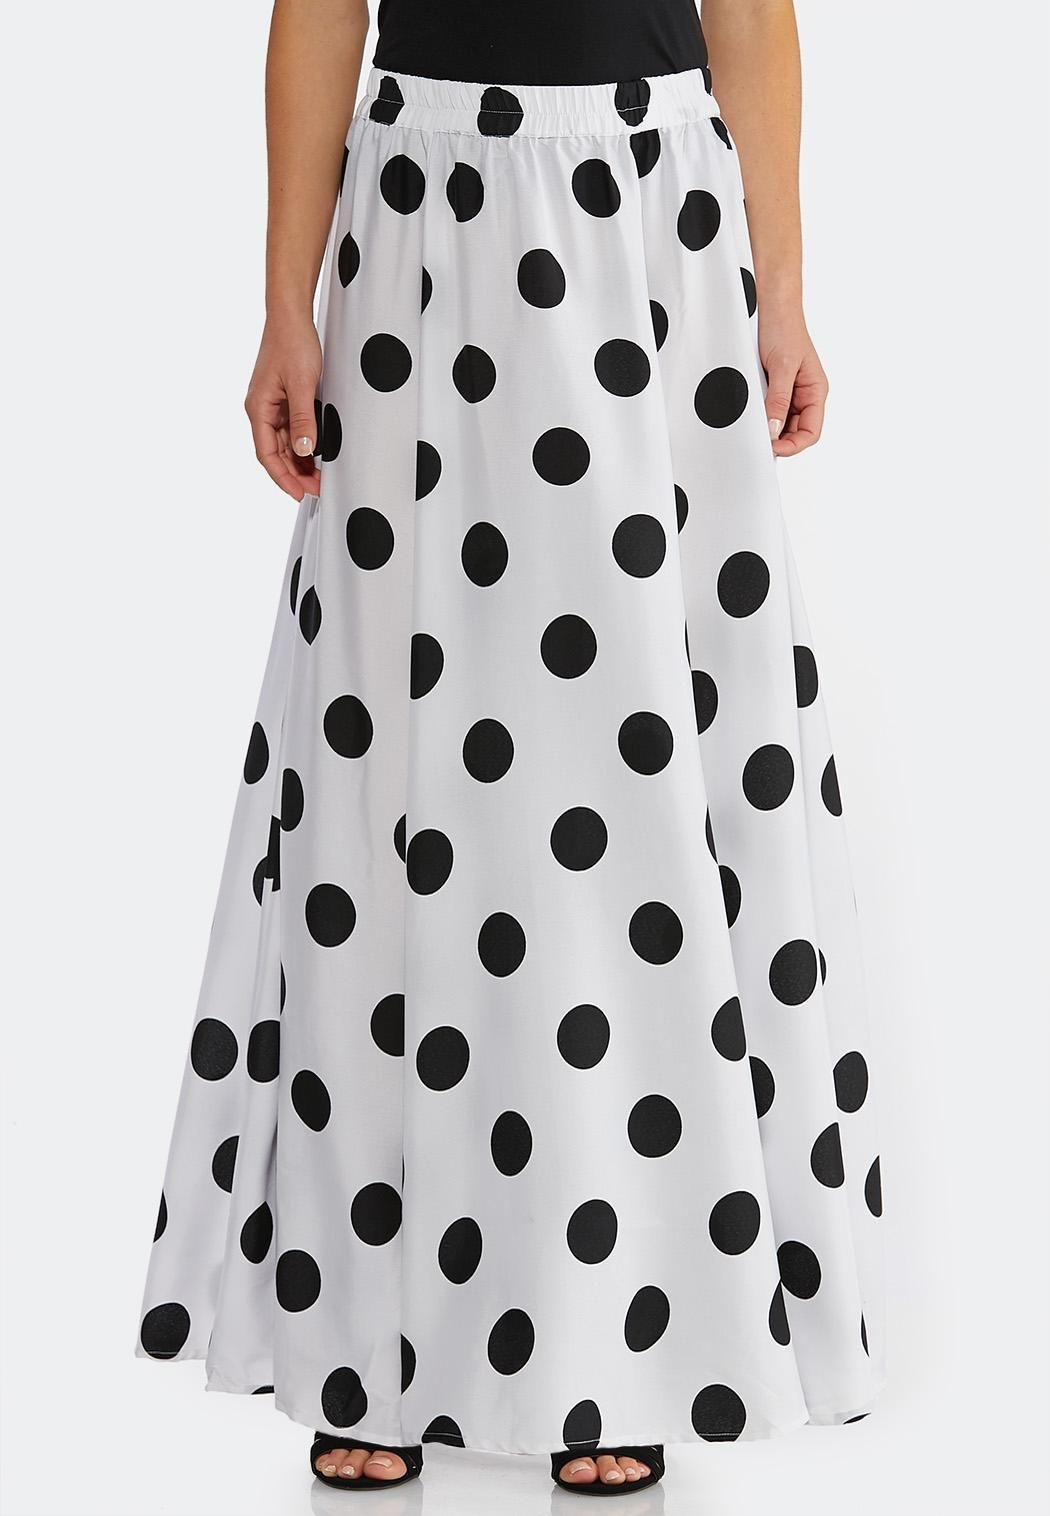 f5d2069c42f Black White Dot Swing Maxi Skirt Maxi Cato Fashions in 2019